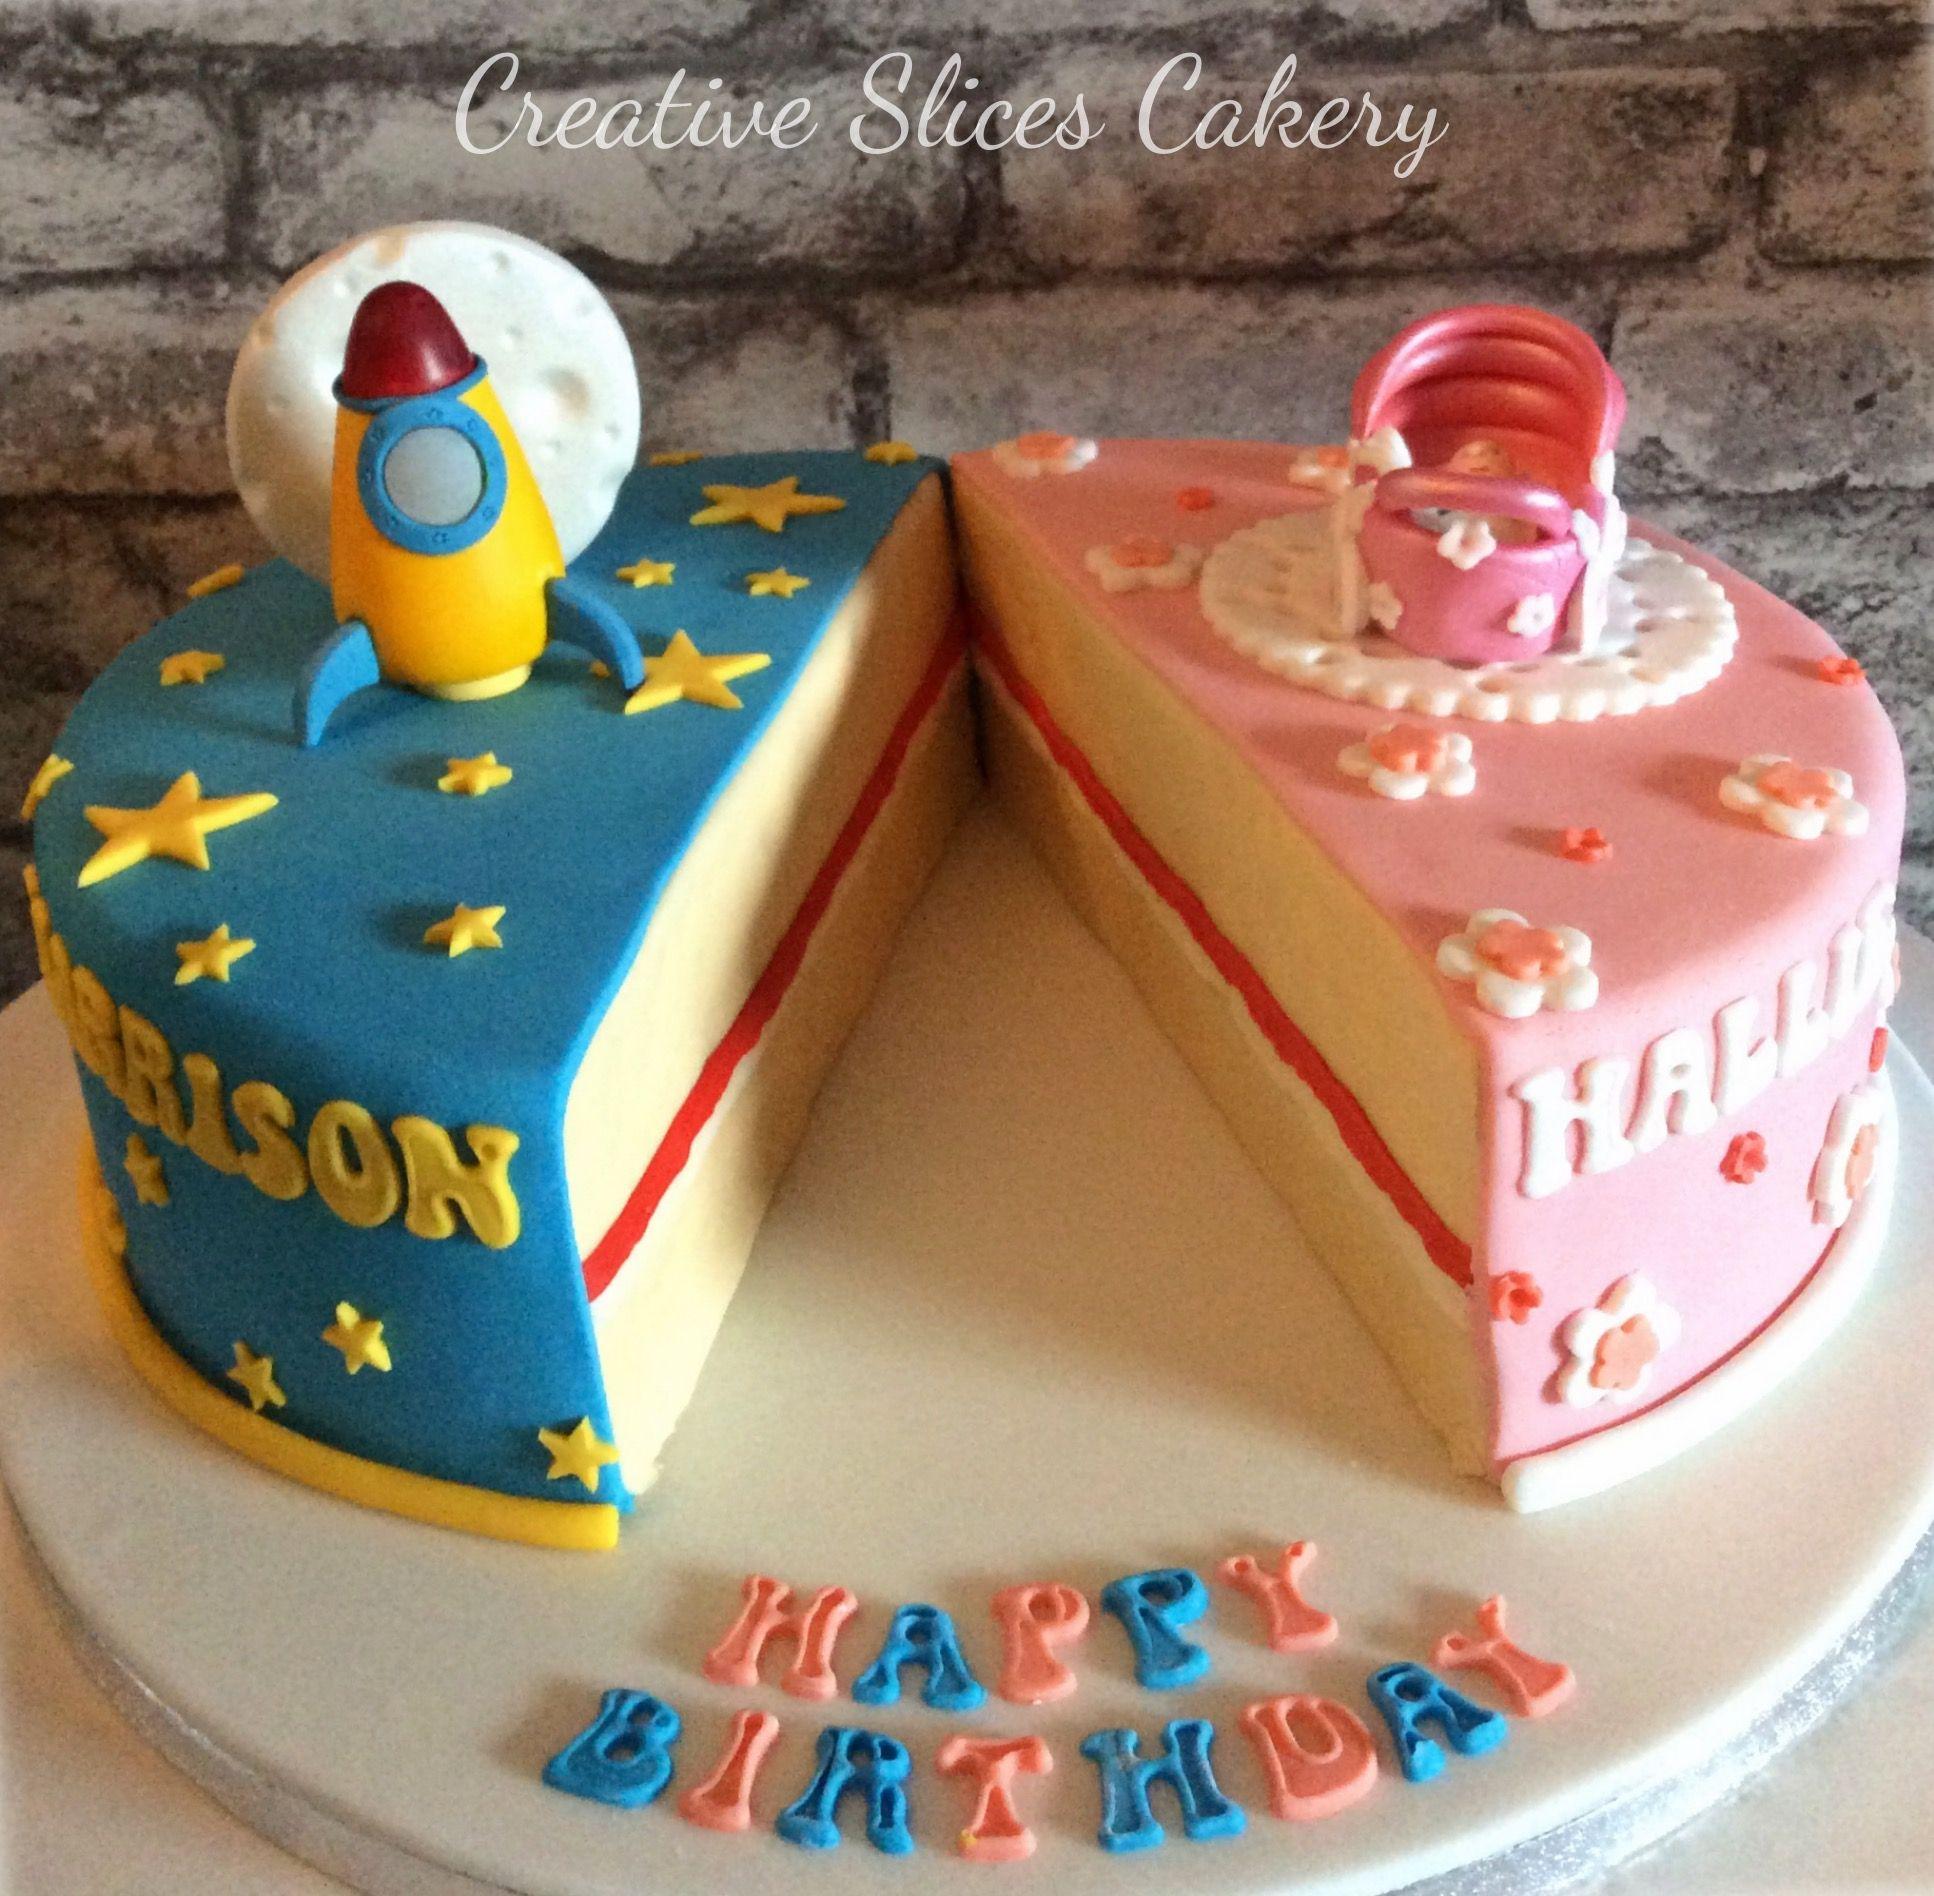 Sensational Split Half And Half Cake For Boy And Girl X Half Birthday Cakes Funny Birthday Cards Online Inifodamsfinfo